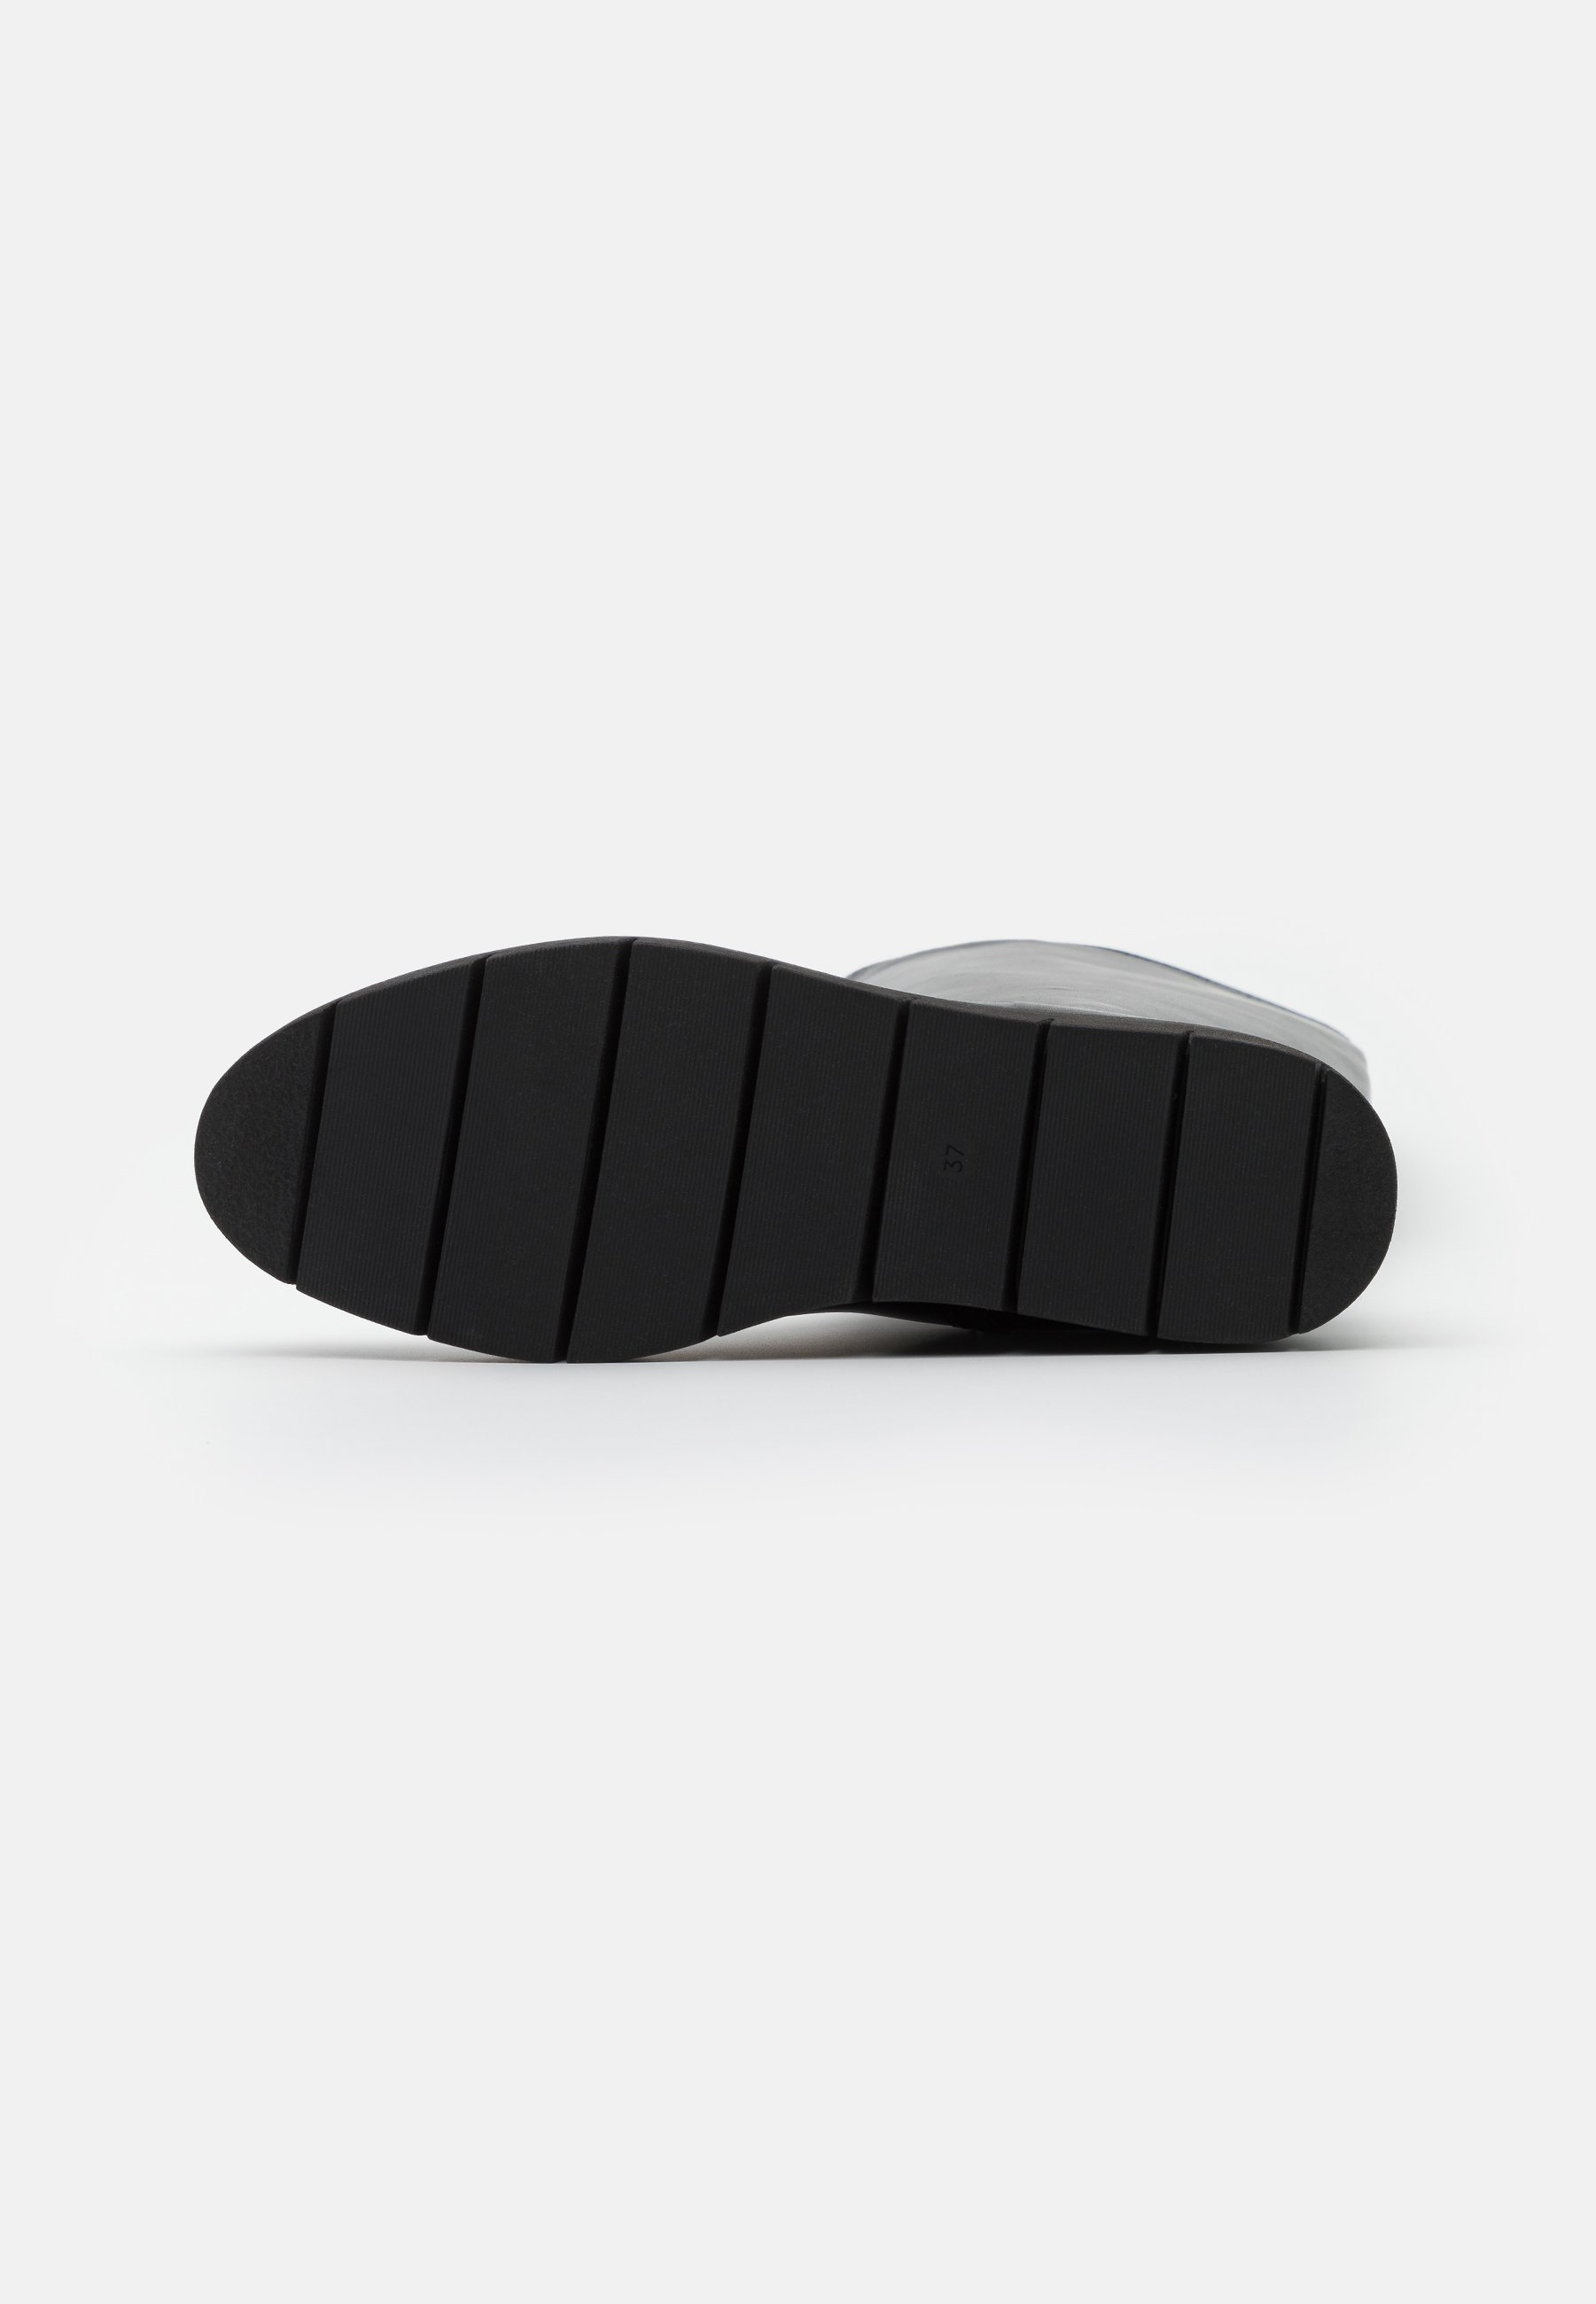 Caprice Plateaustiefel - Black/schwarz